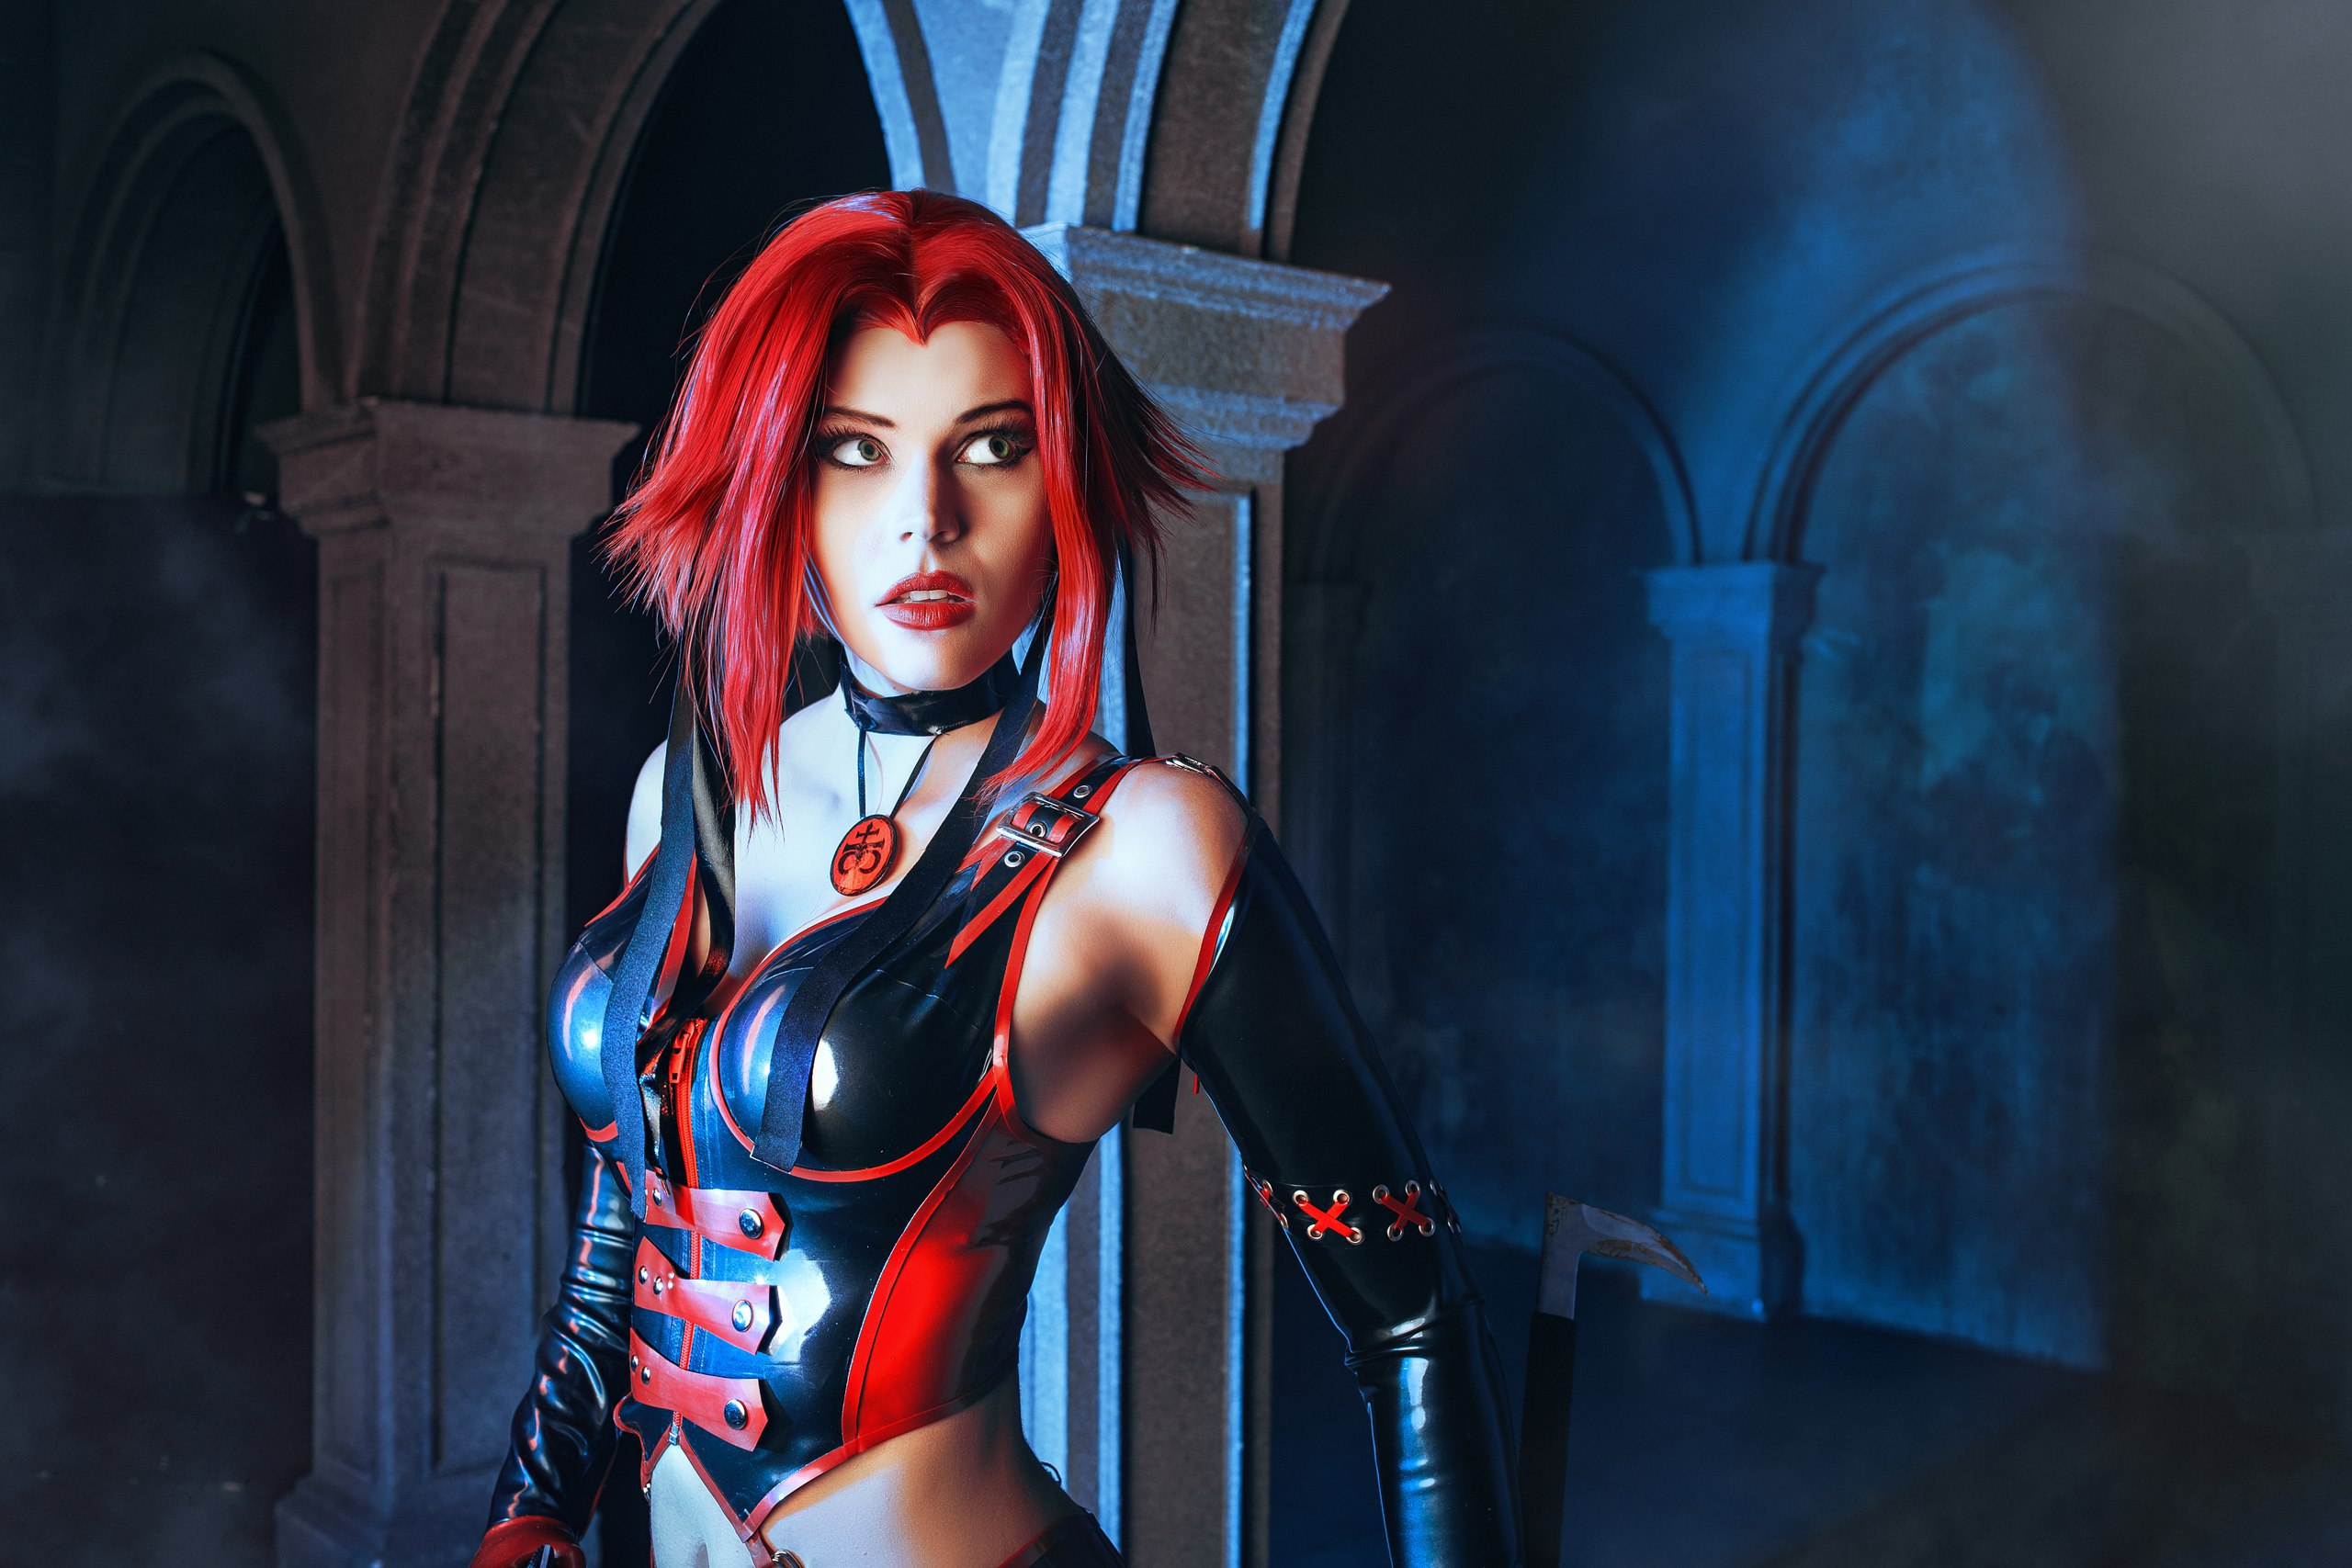 BloodRayne, Бладрейн, косплей, cosplay, девушка, фото